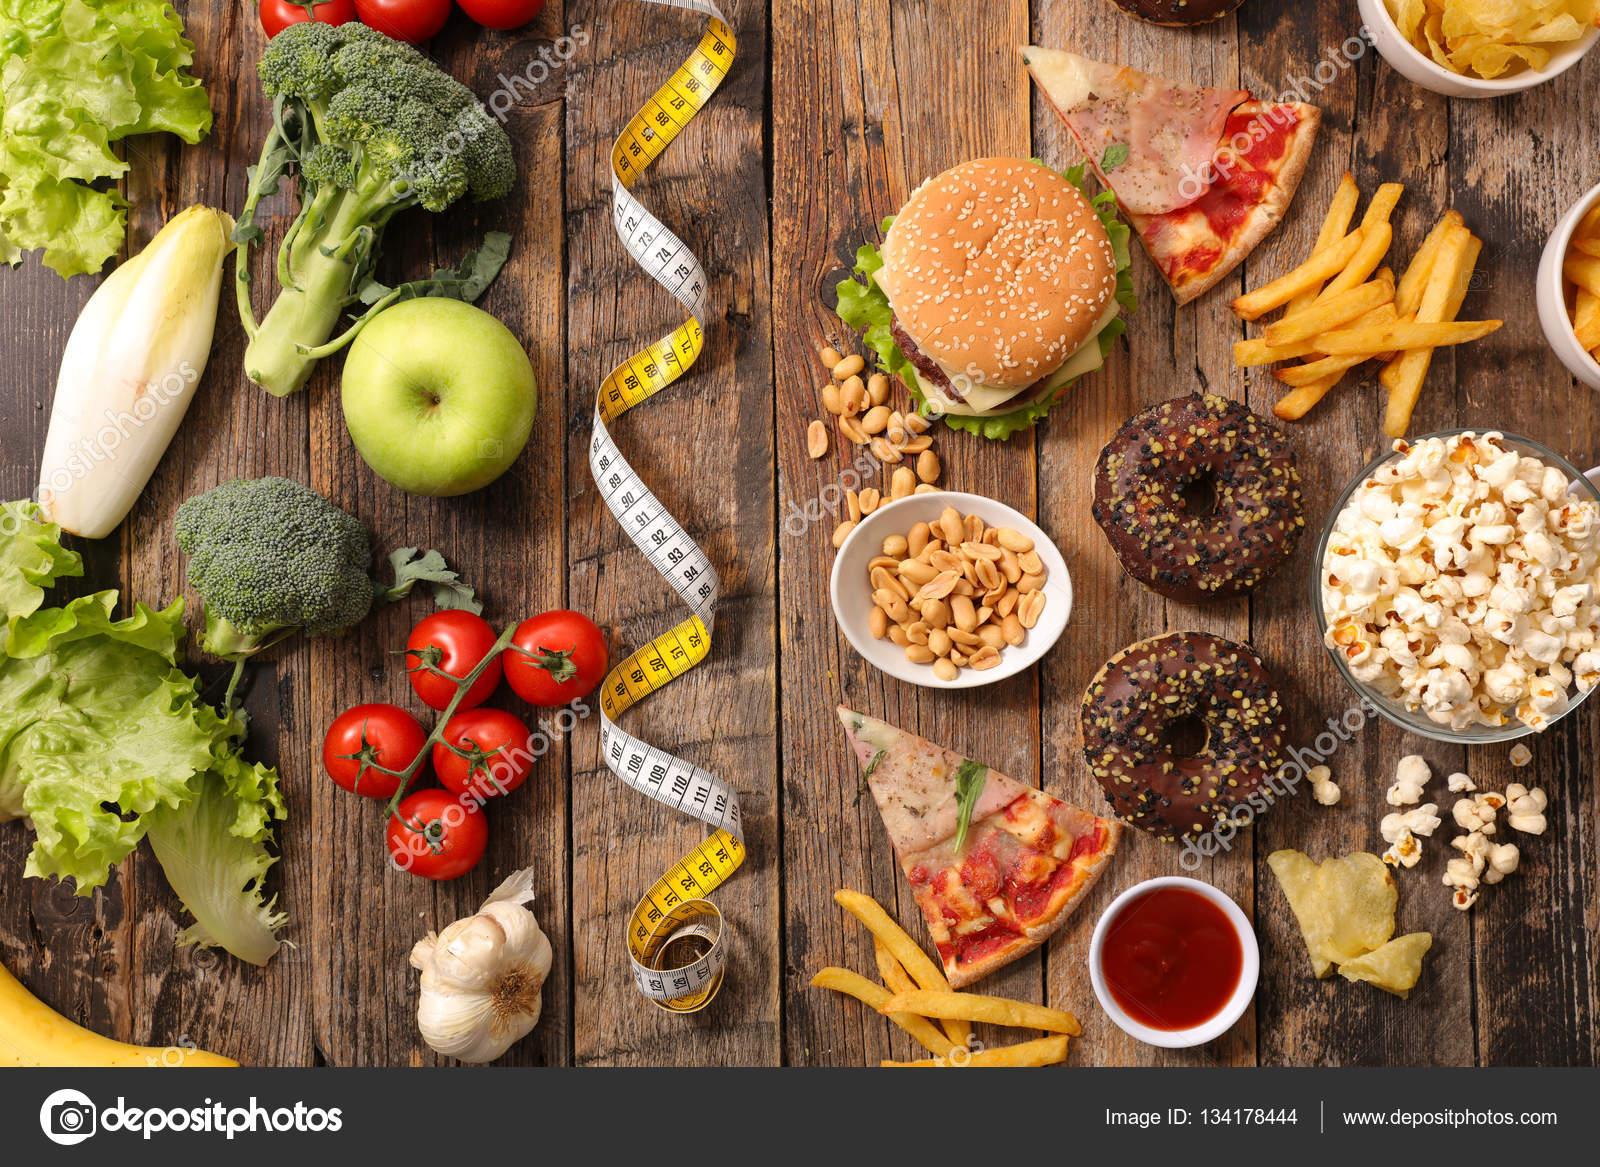 Foto comida sana  comida sana o comida chatarra  Foto